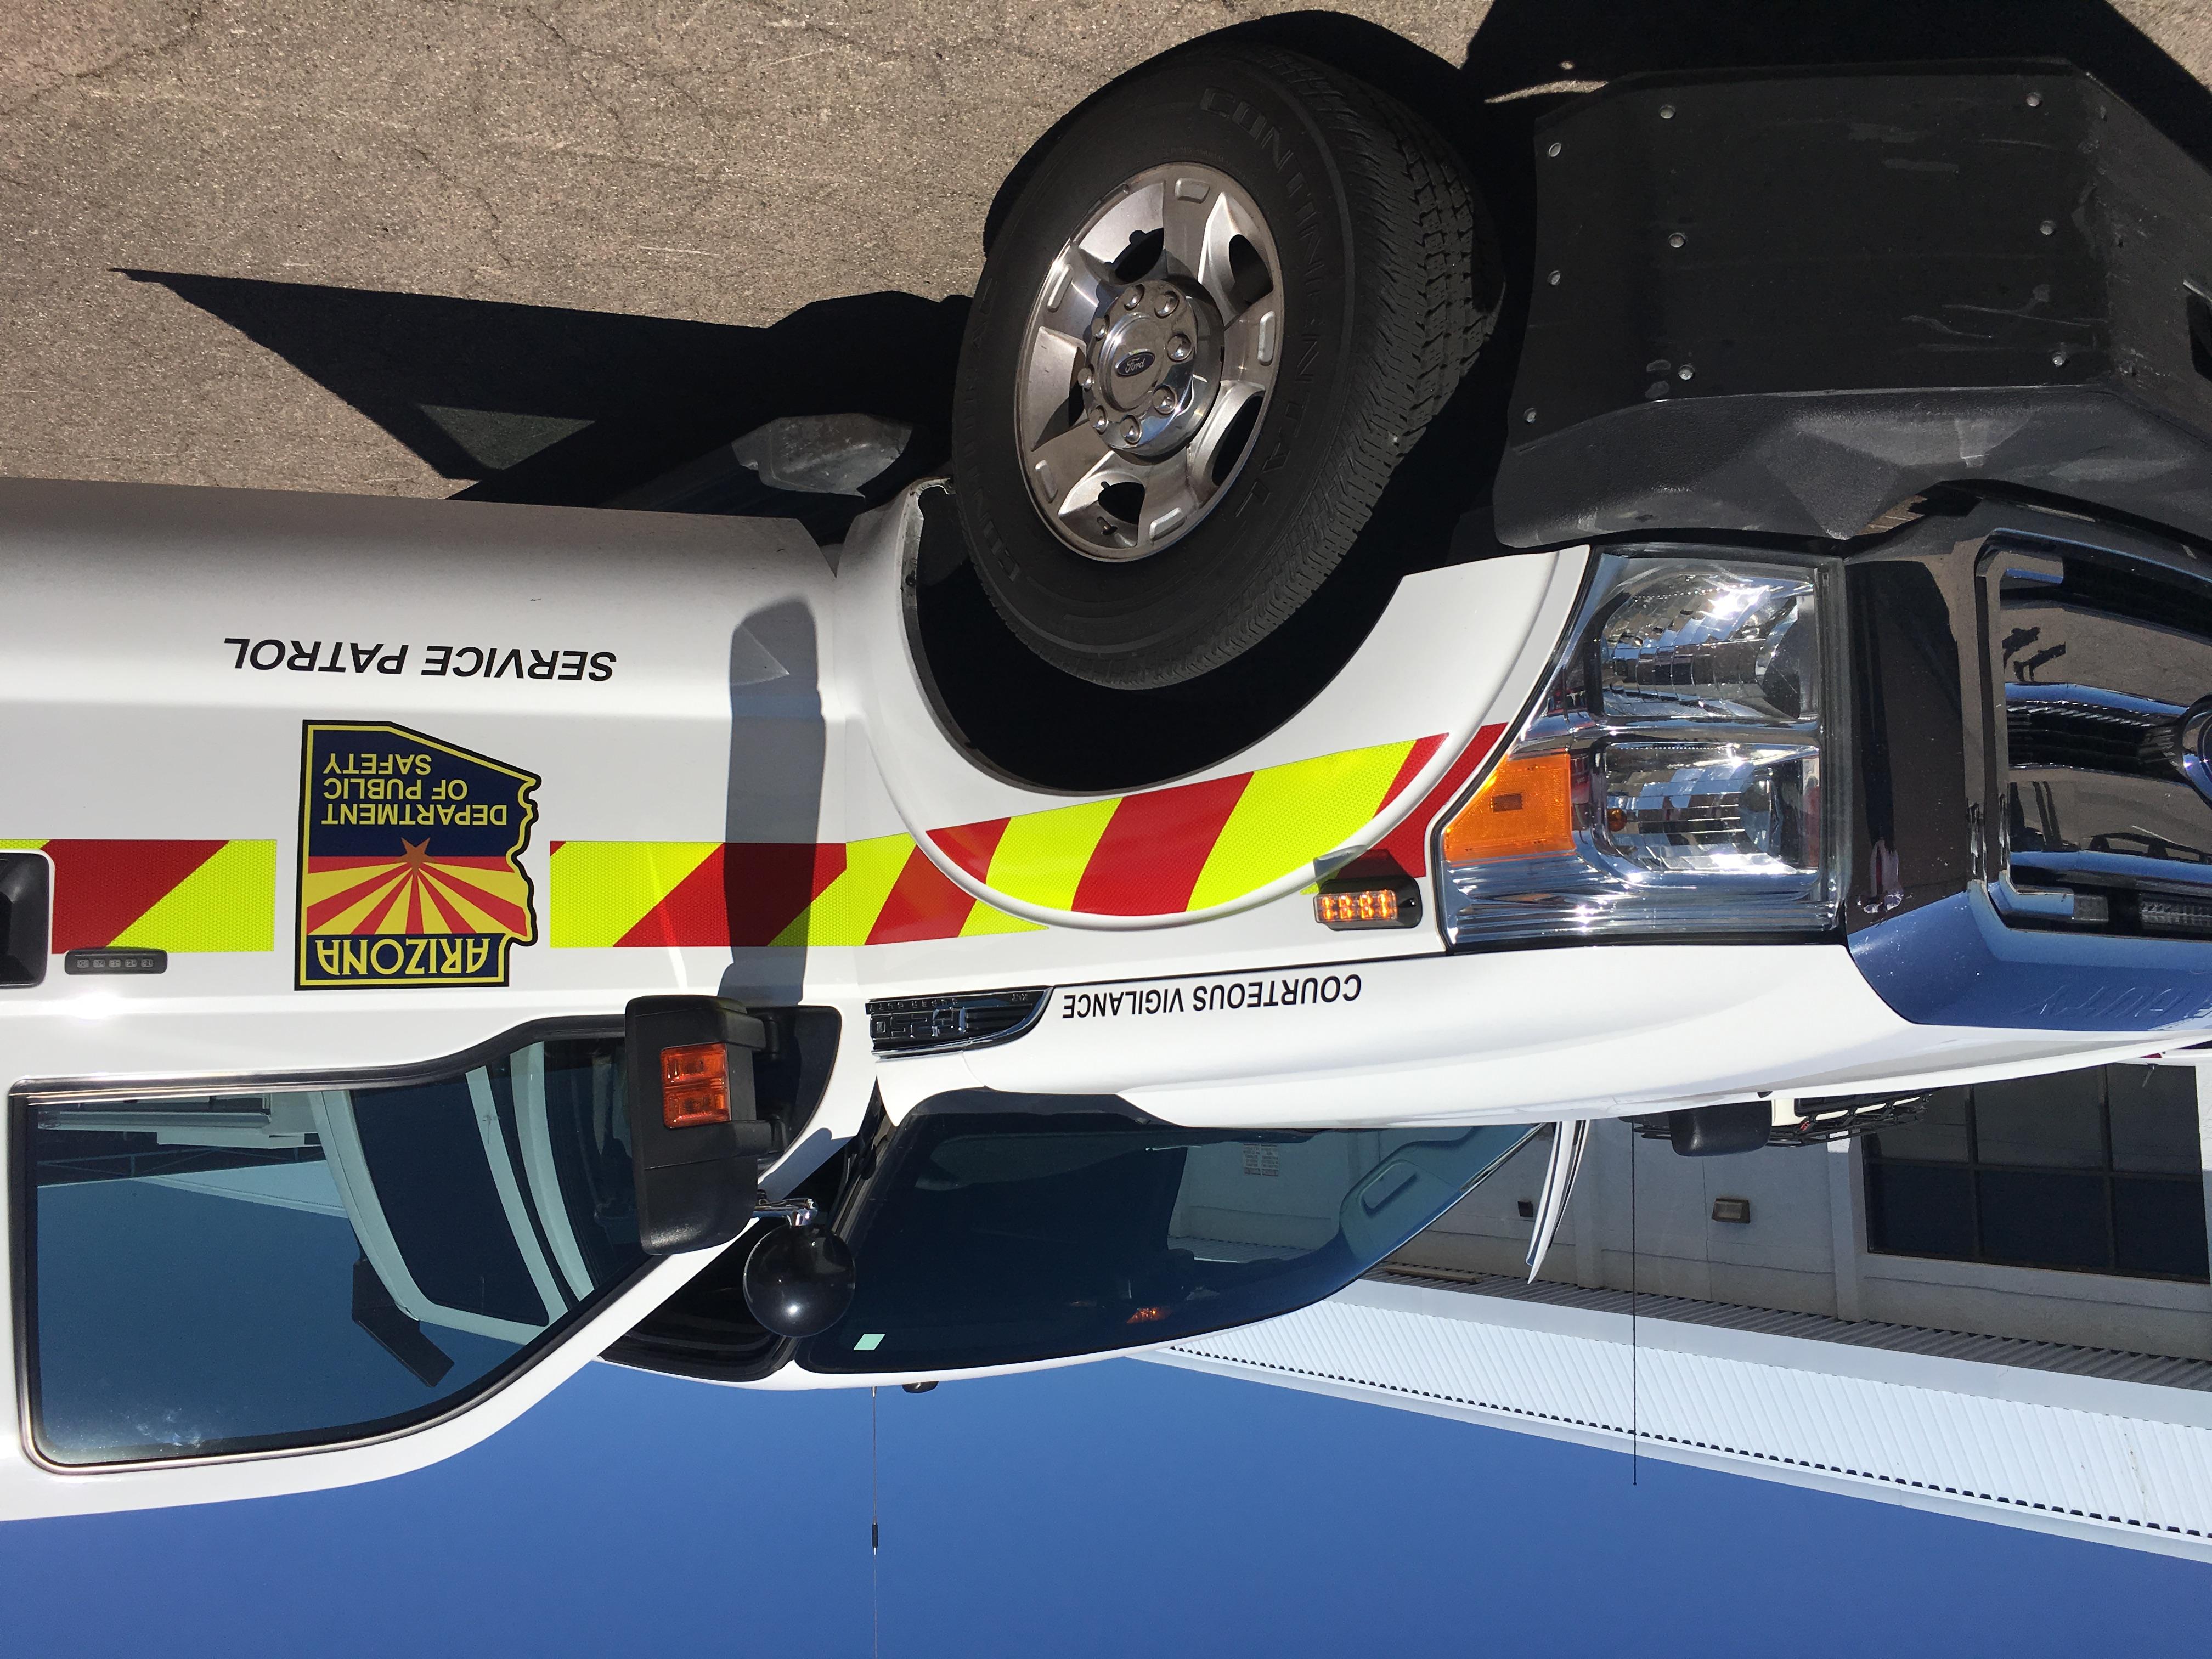 Roadside motorist assistance rma arizona department of for Arizona department of transportation motor vehicle division phoenix az